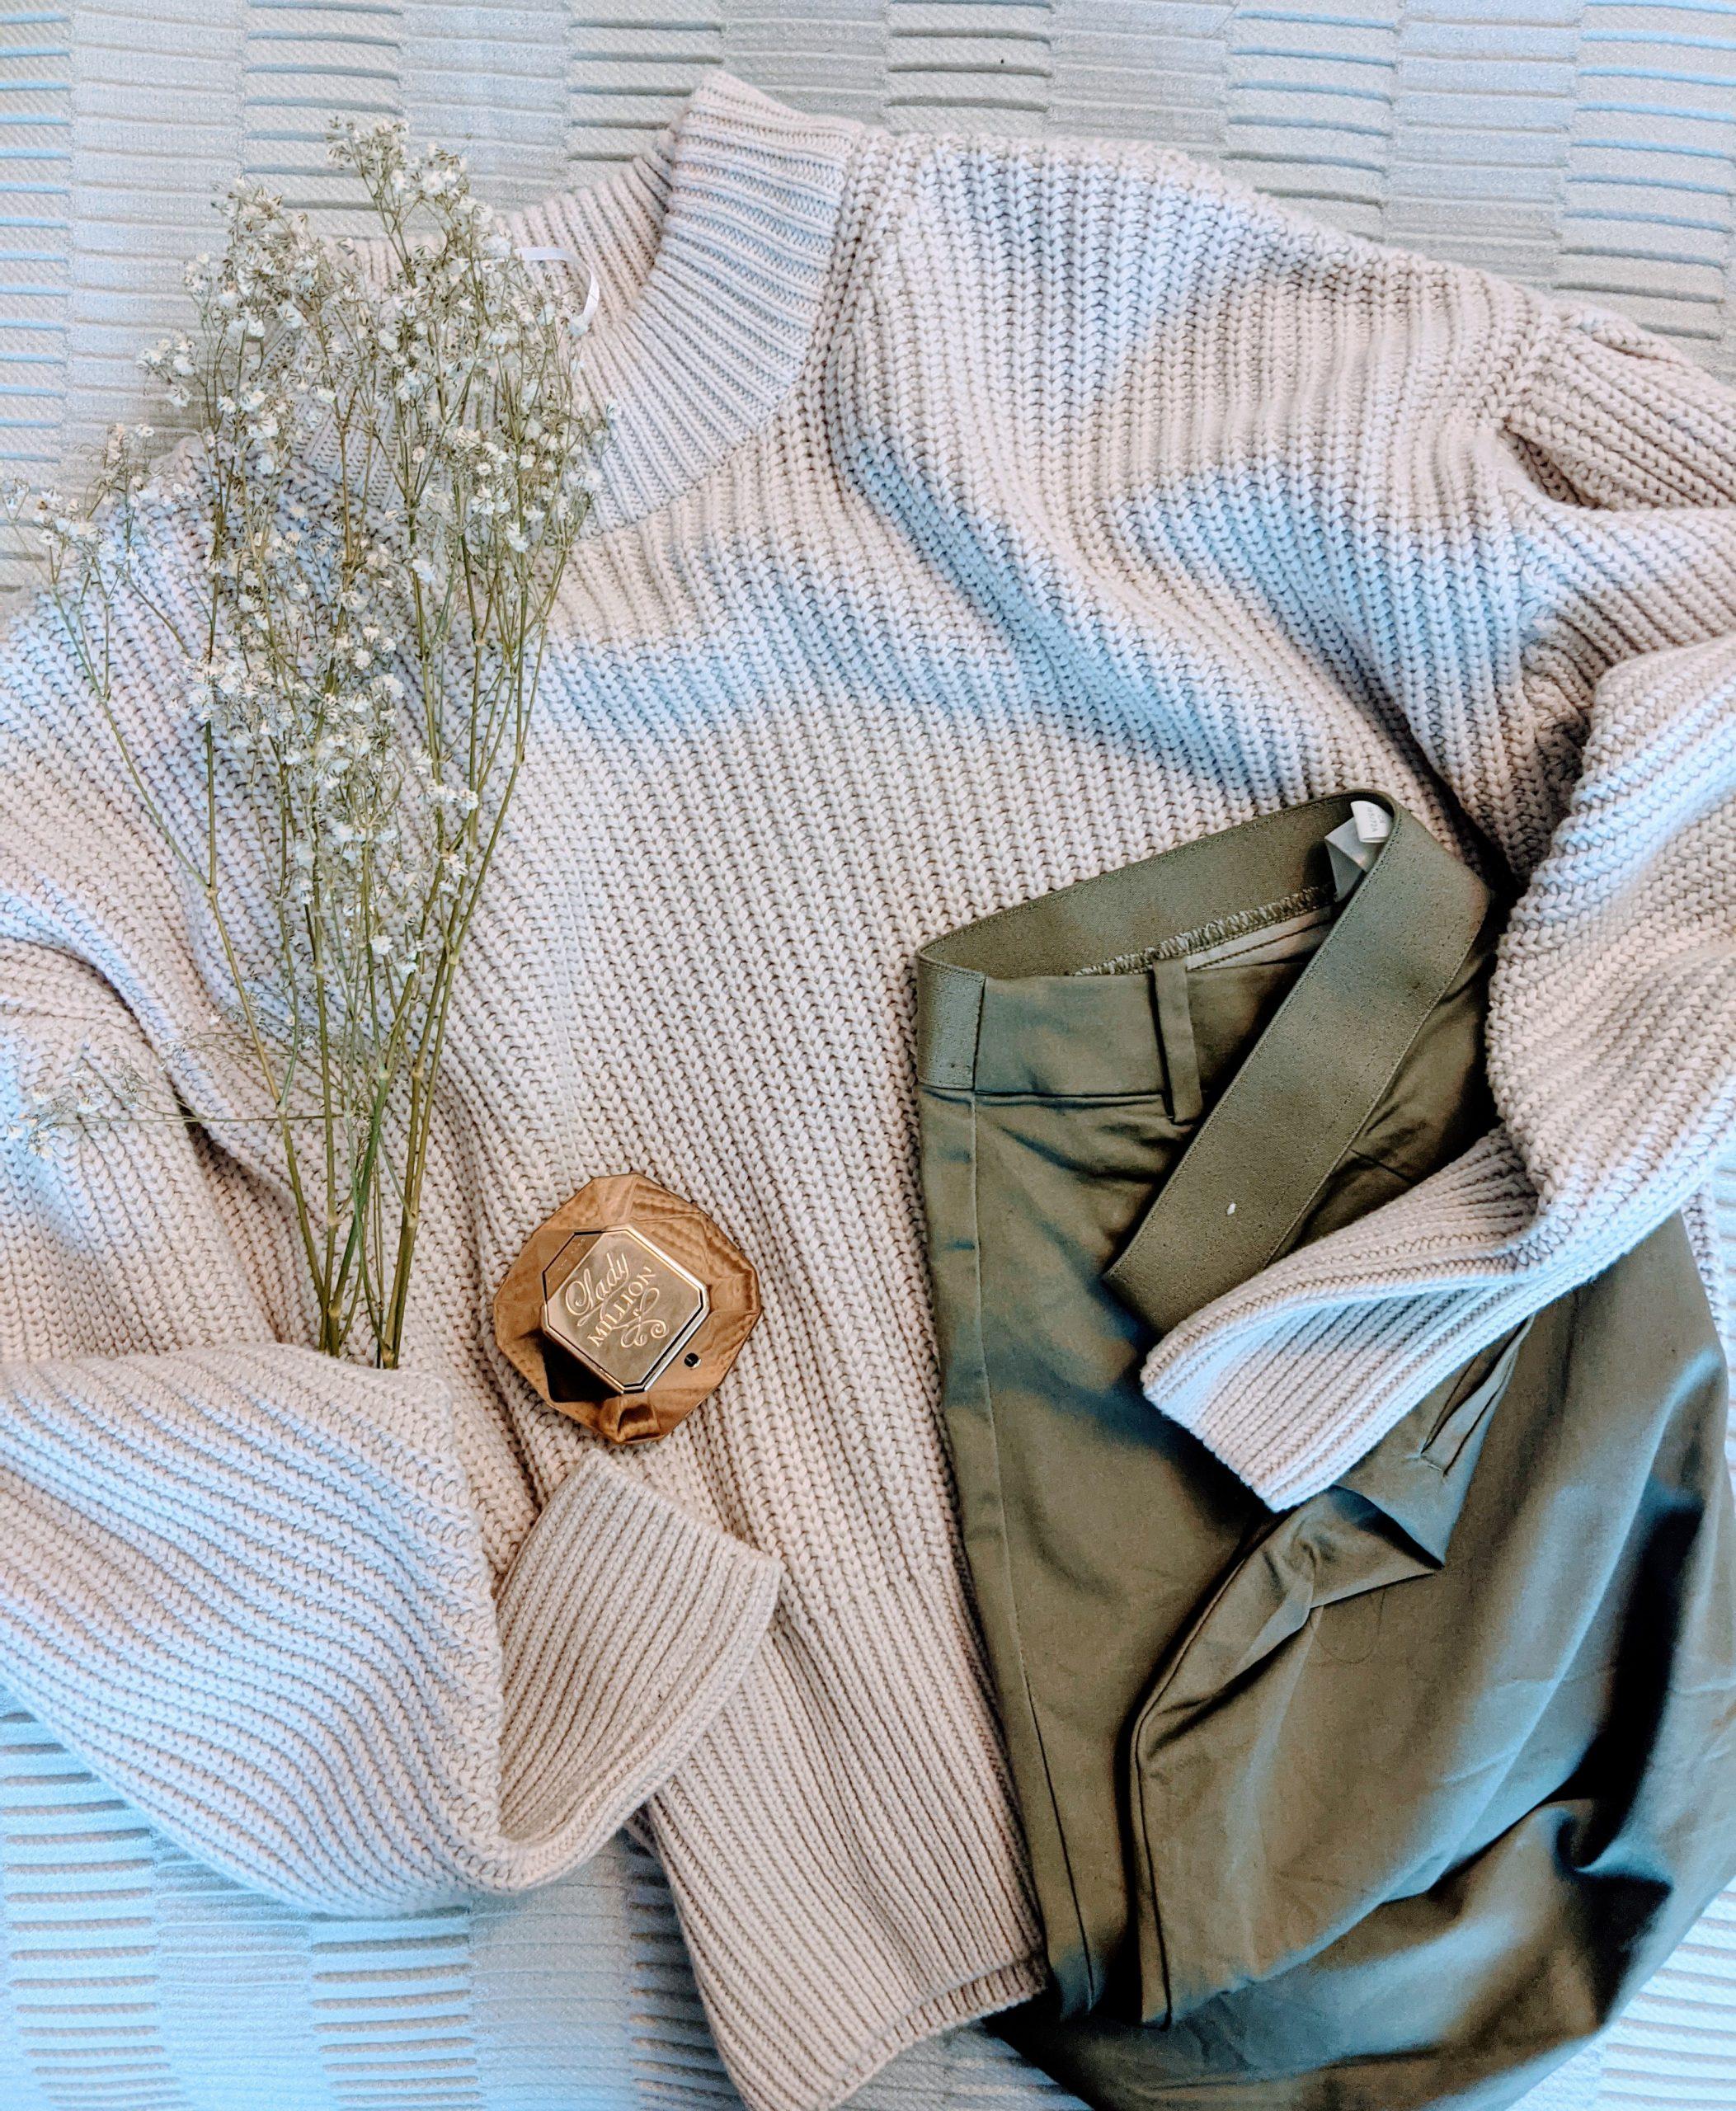 My Winter Wardrobe Thanks to H&M